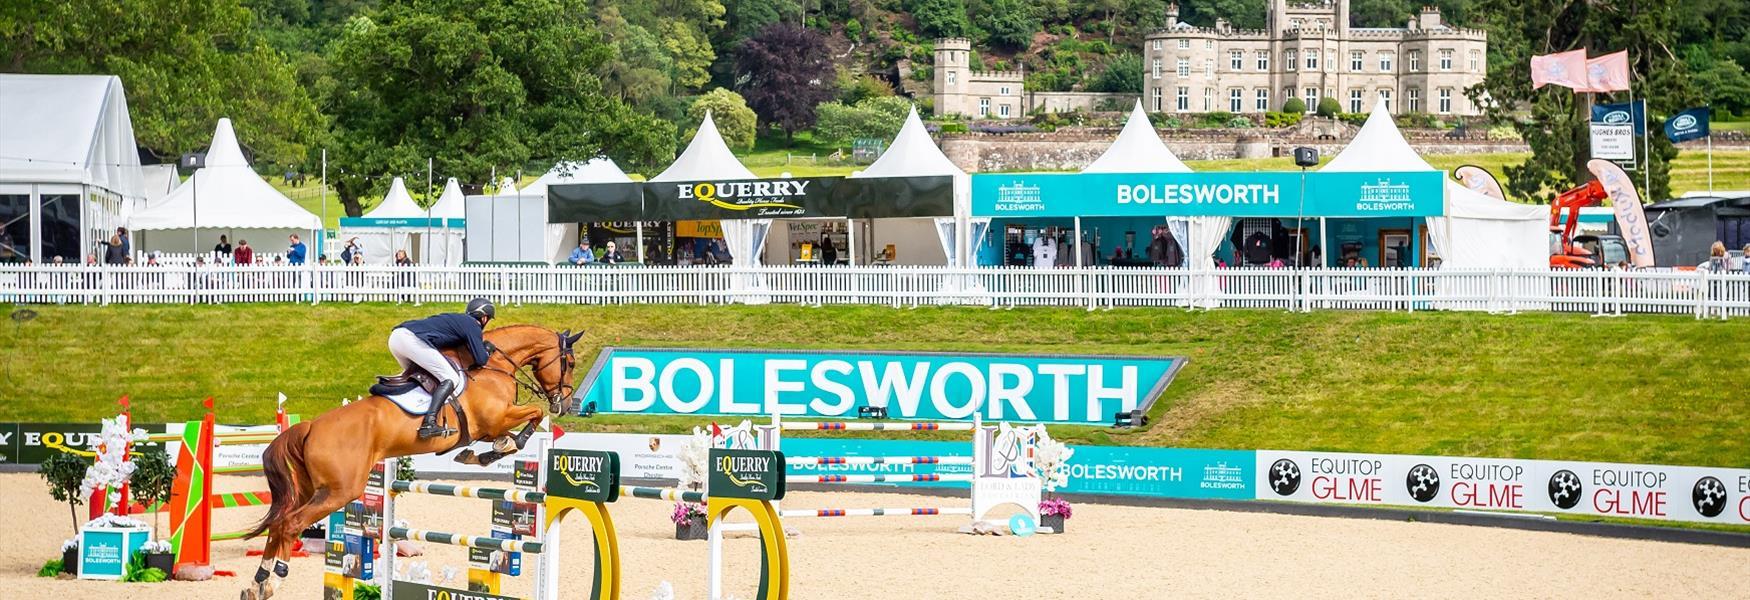 Dodson & Horrell Bolesworth International Horse Show